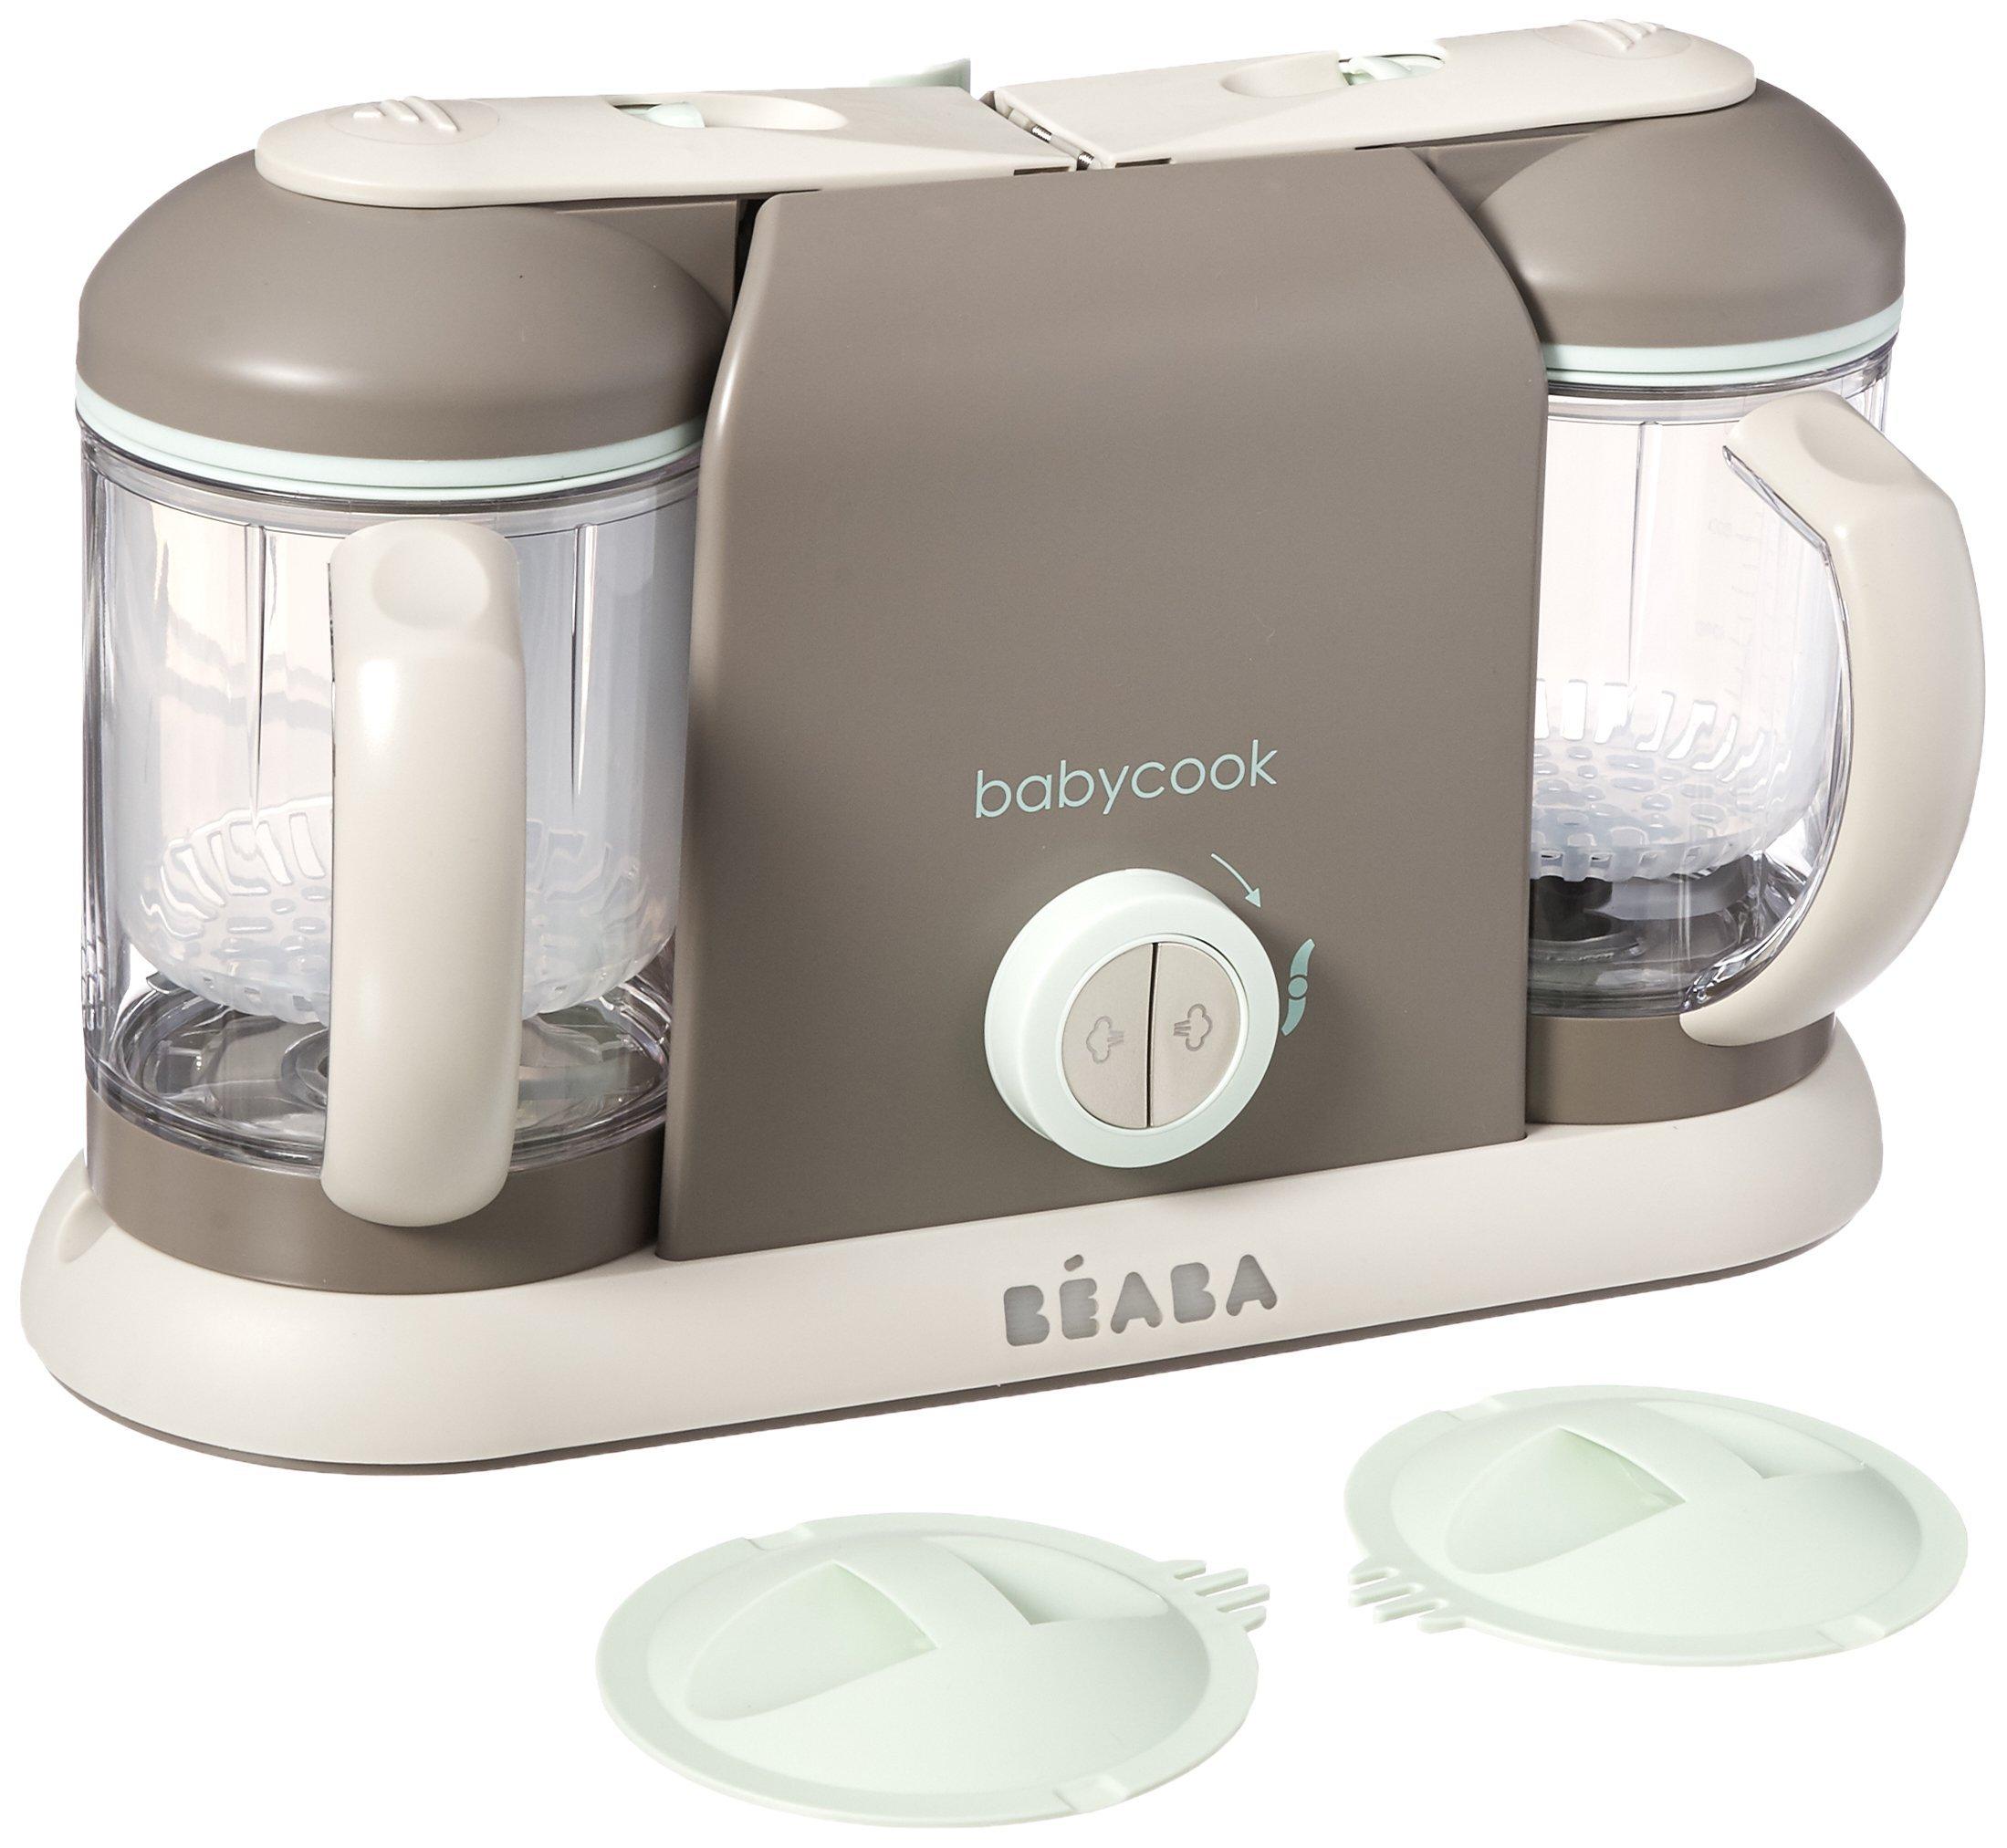 BEABA Babycook Pro 2X, Latte Mint (Renewed)